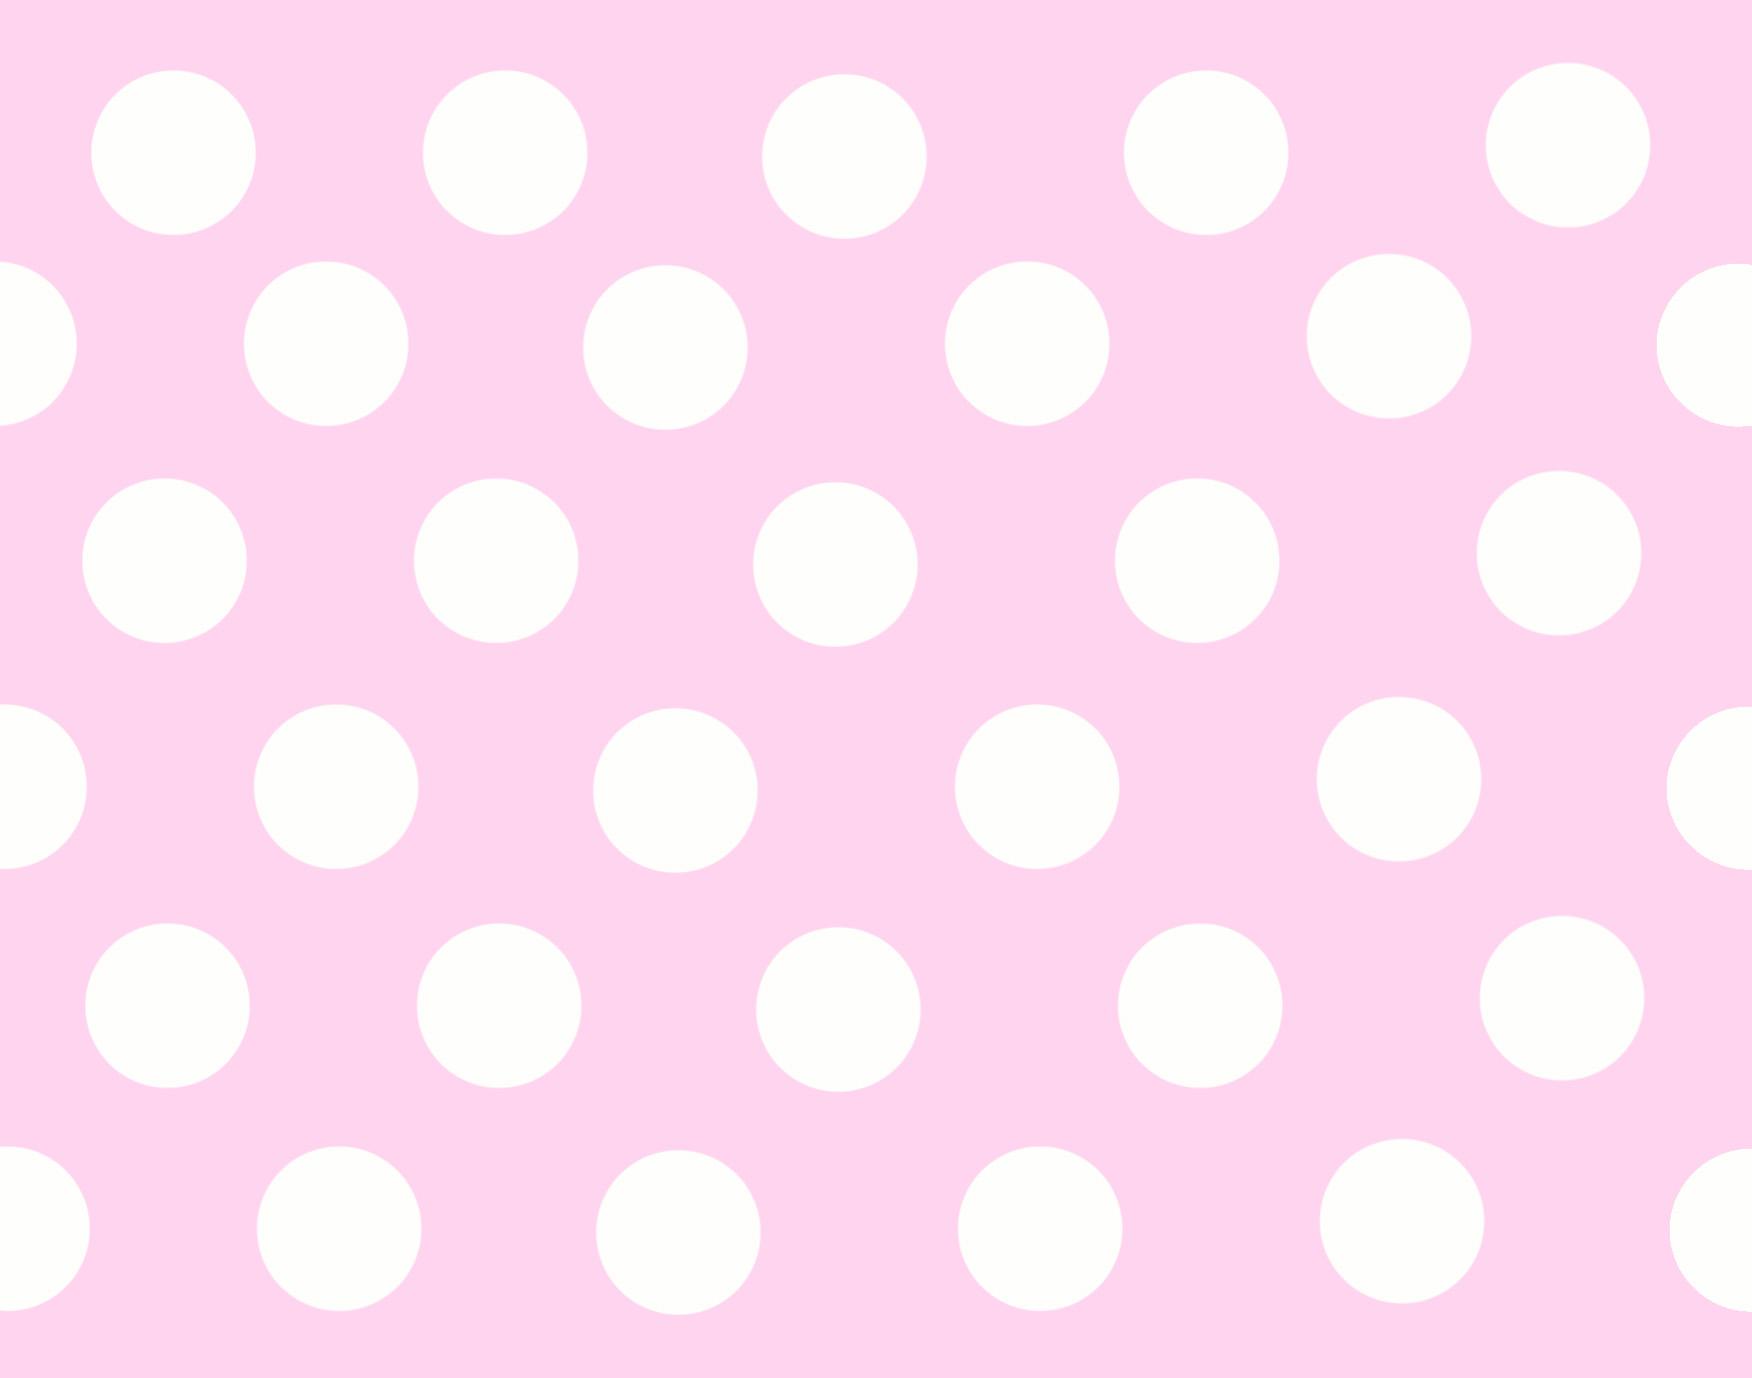 dots them pink - photo #9